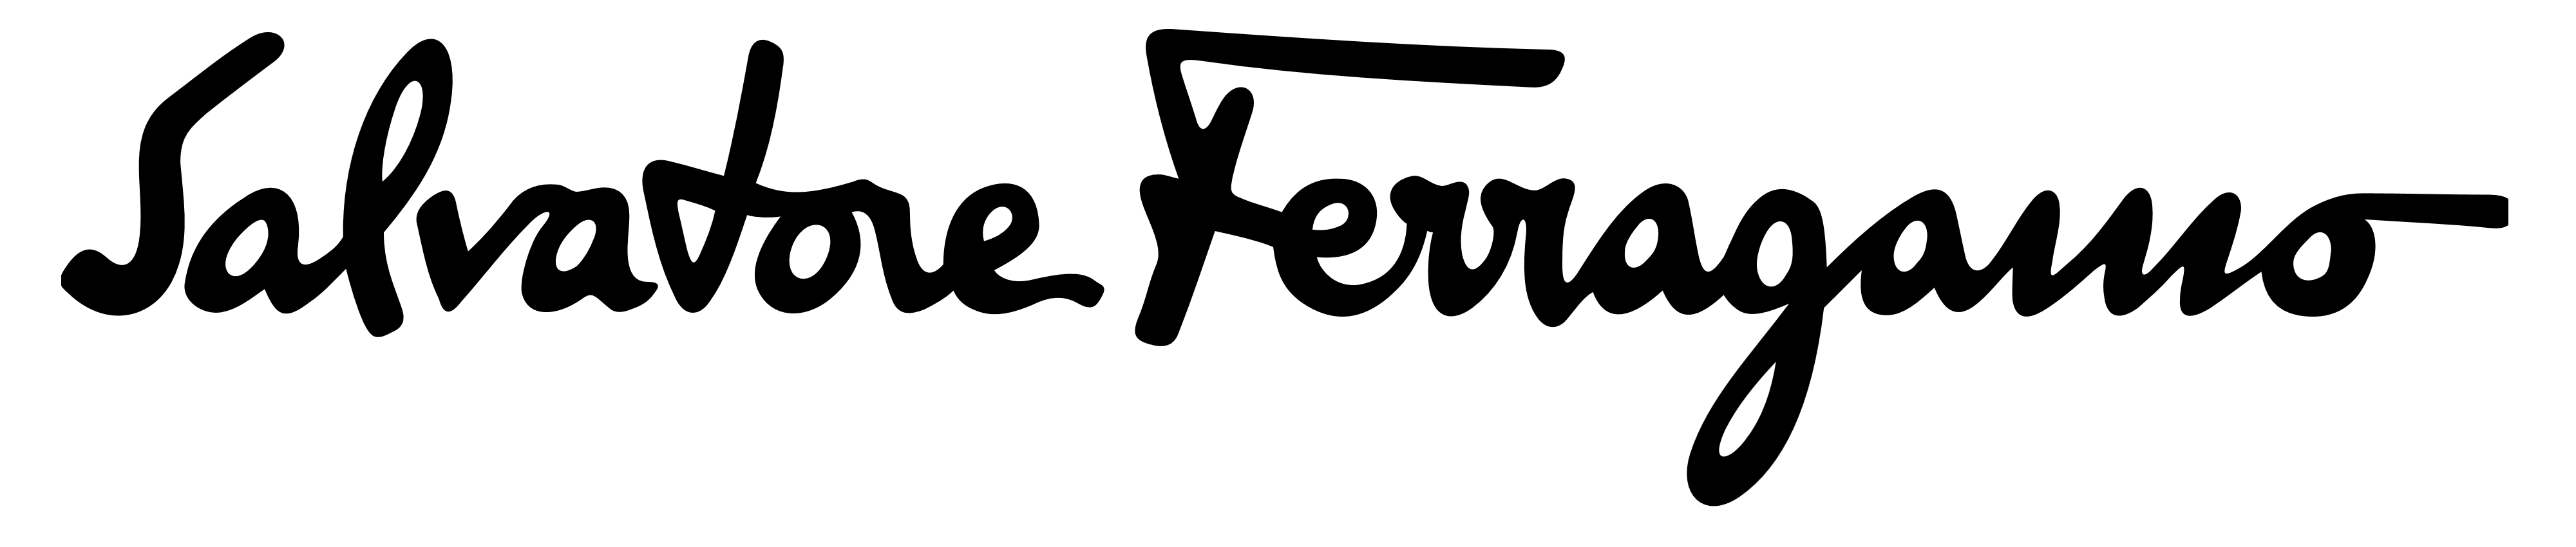 Salvatore_Ferragamo_logo